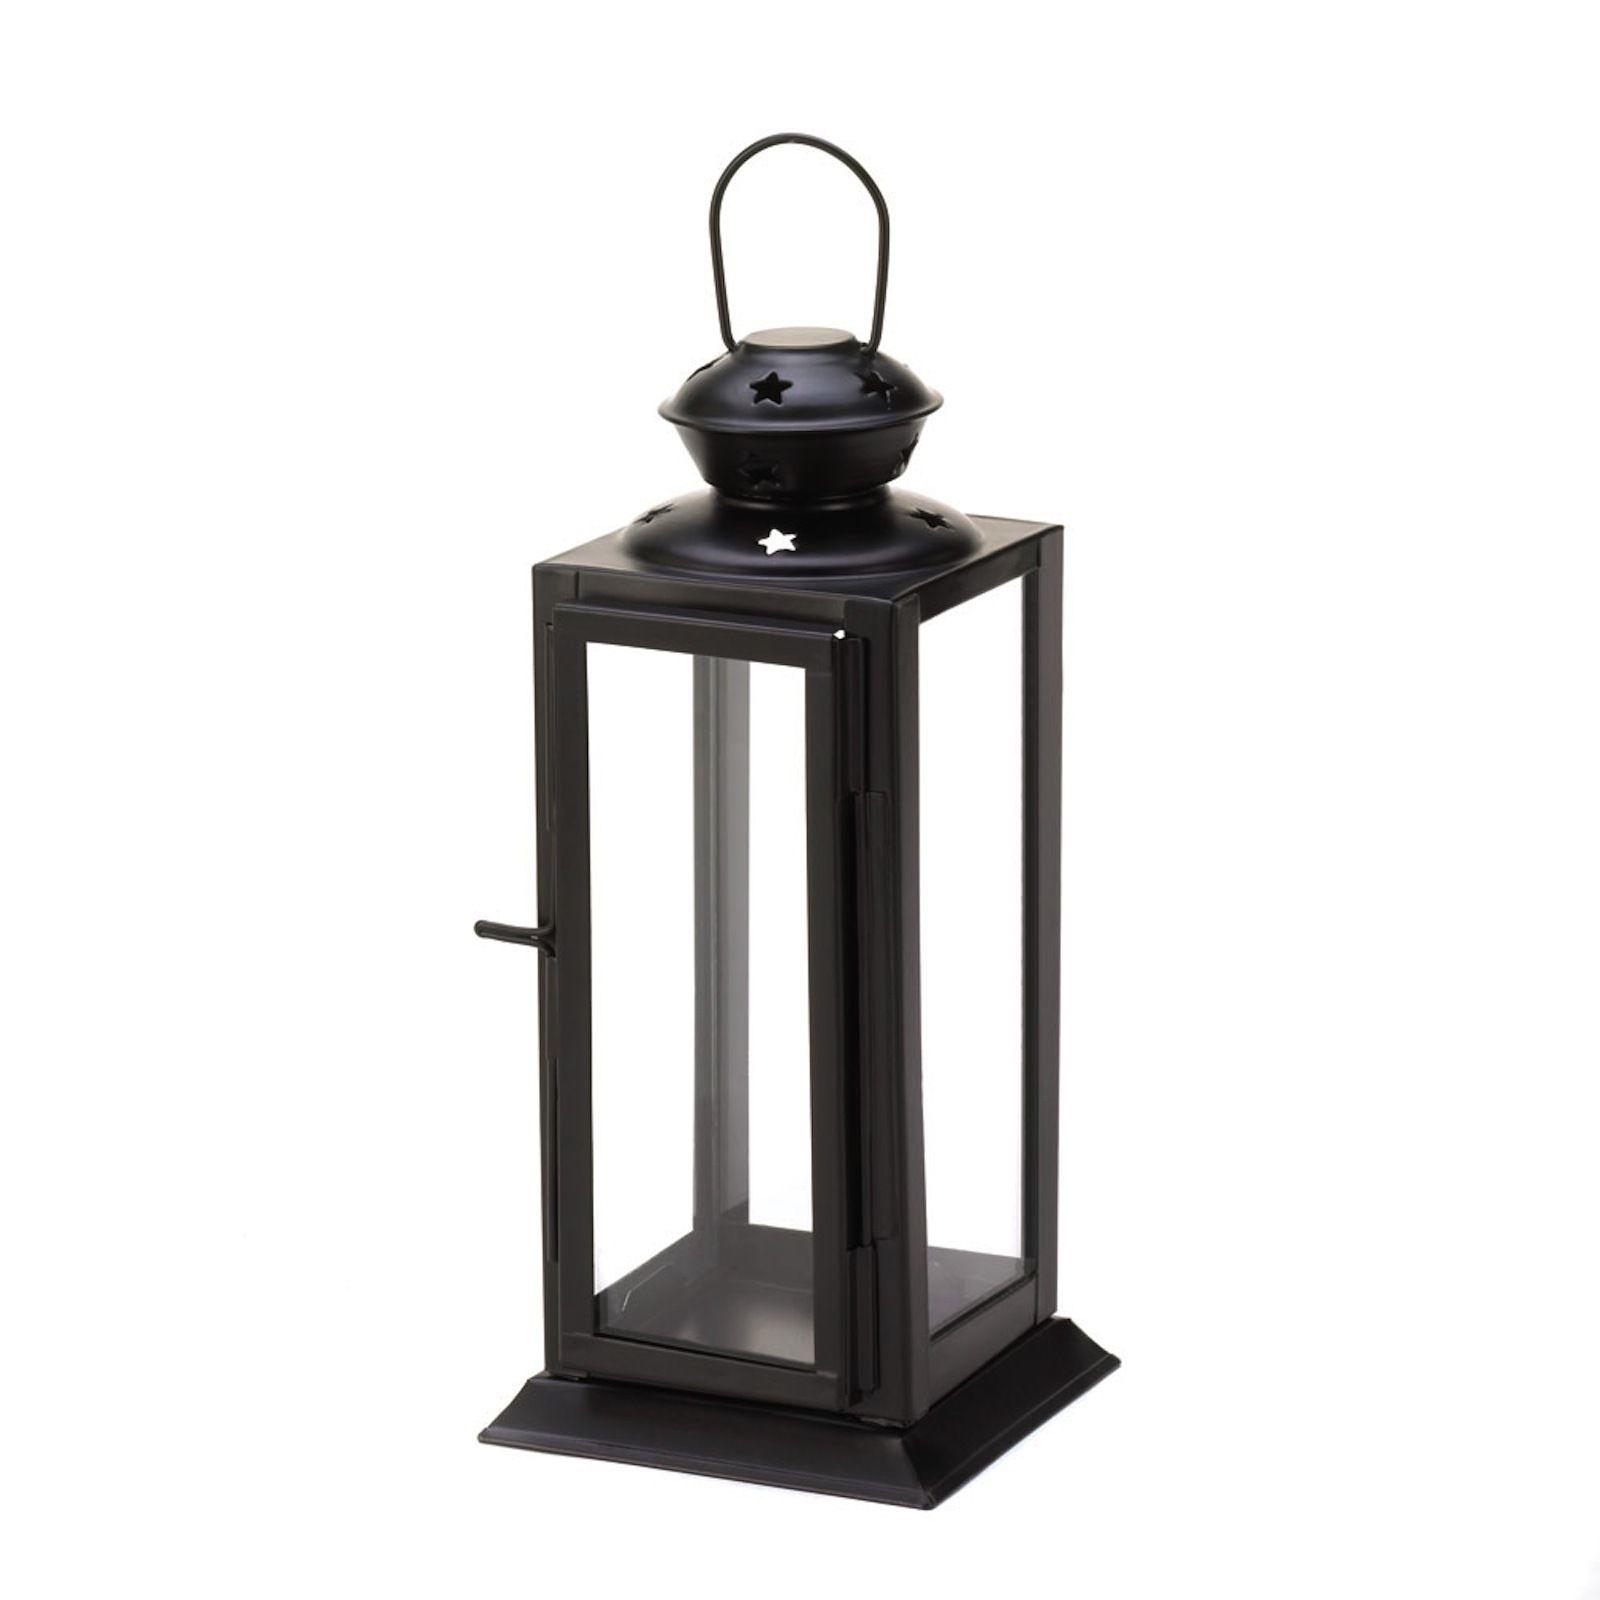 10 BLACK Lantern Candle Holder WEDDING Centerpieces image 2